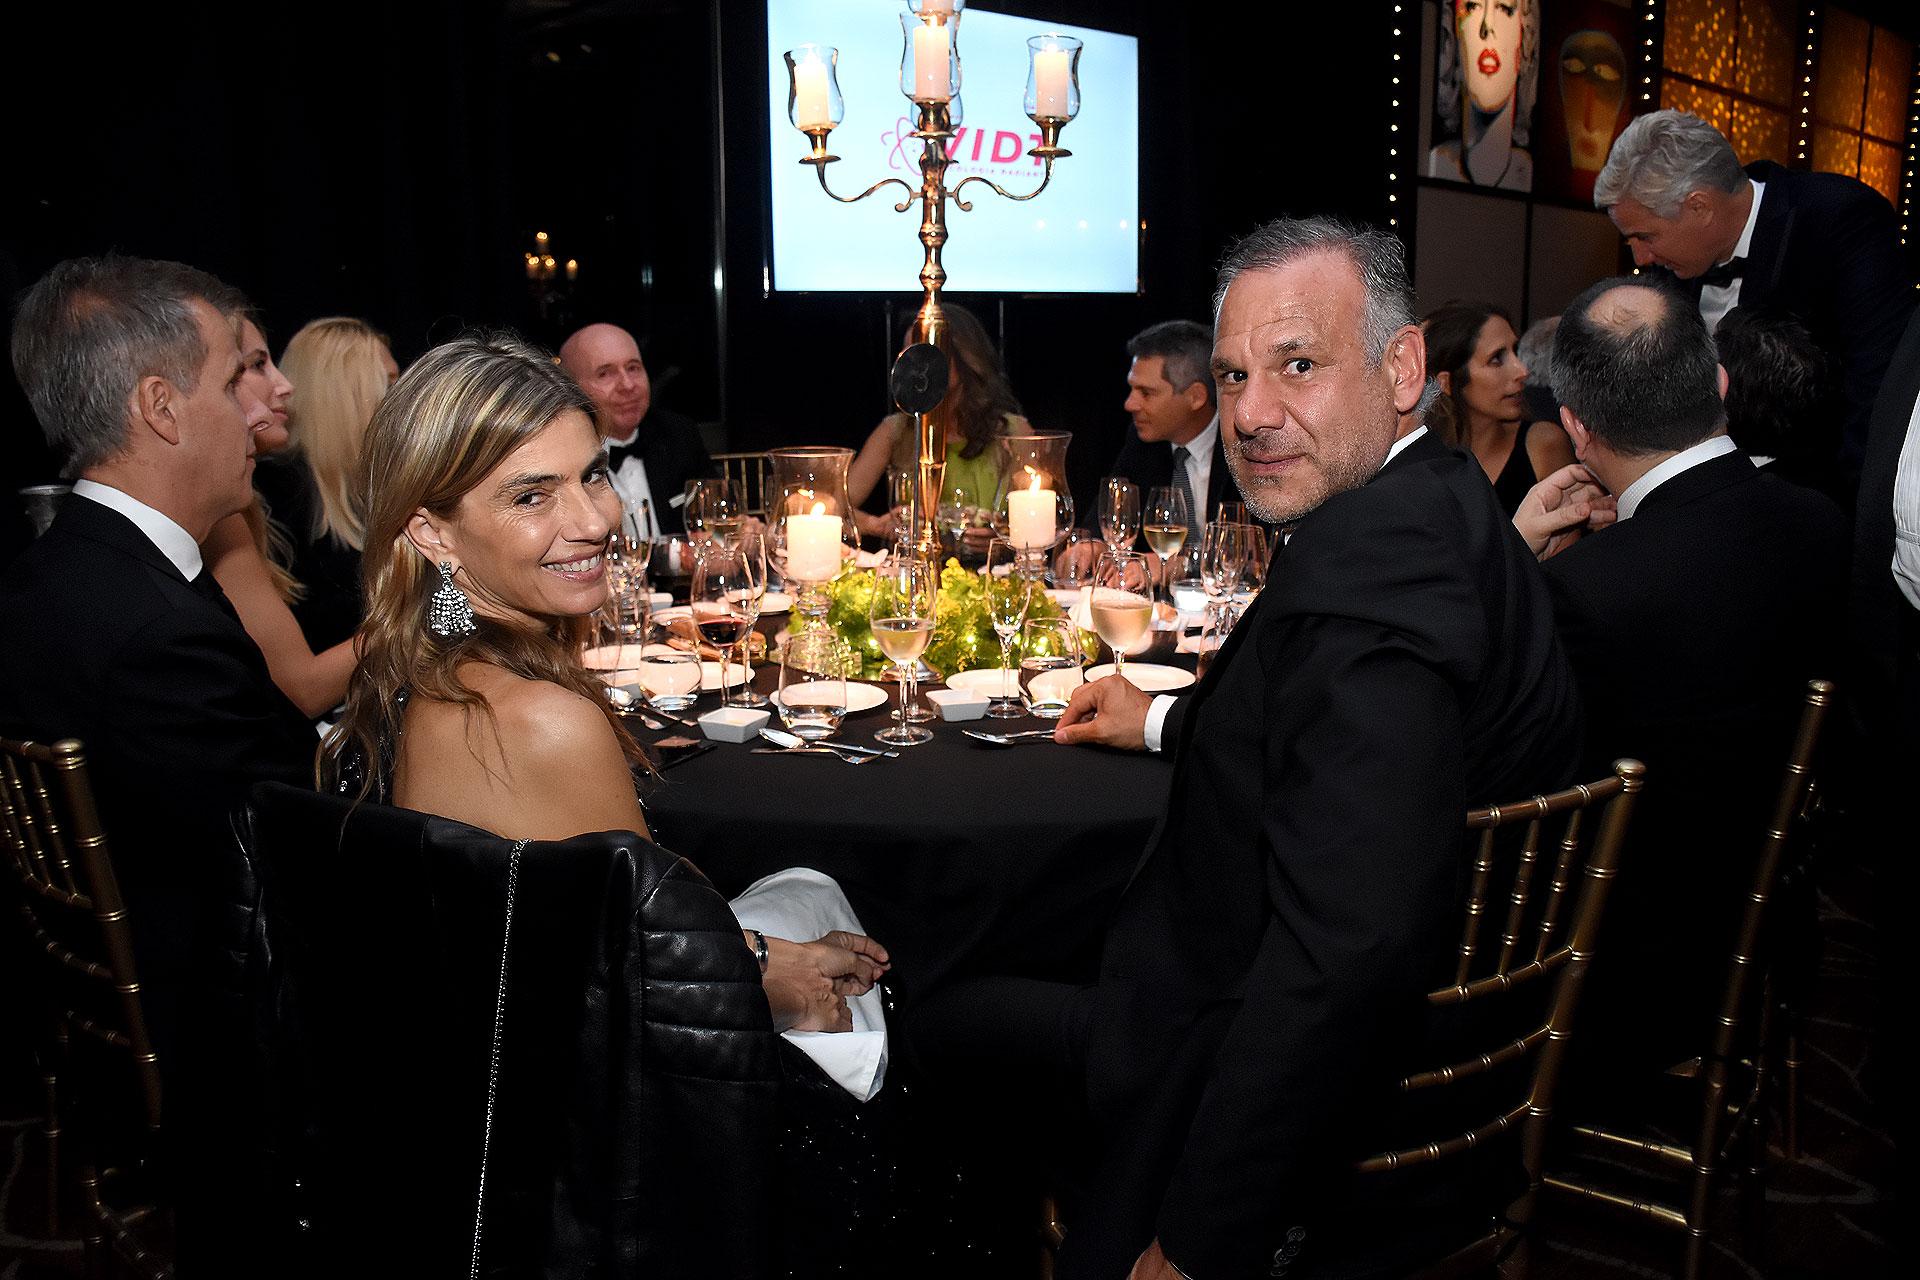 Luis Galli, presidente de Newsan, y su mujer Angie Reyser